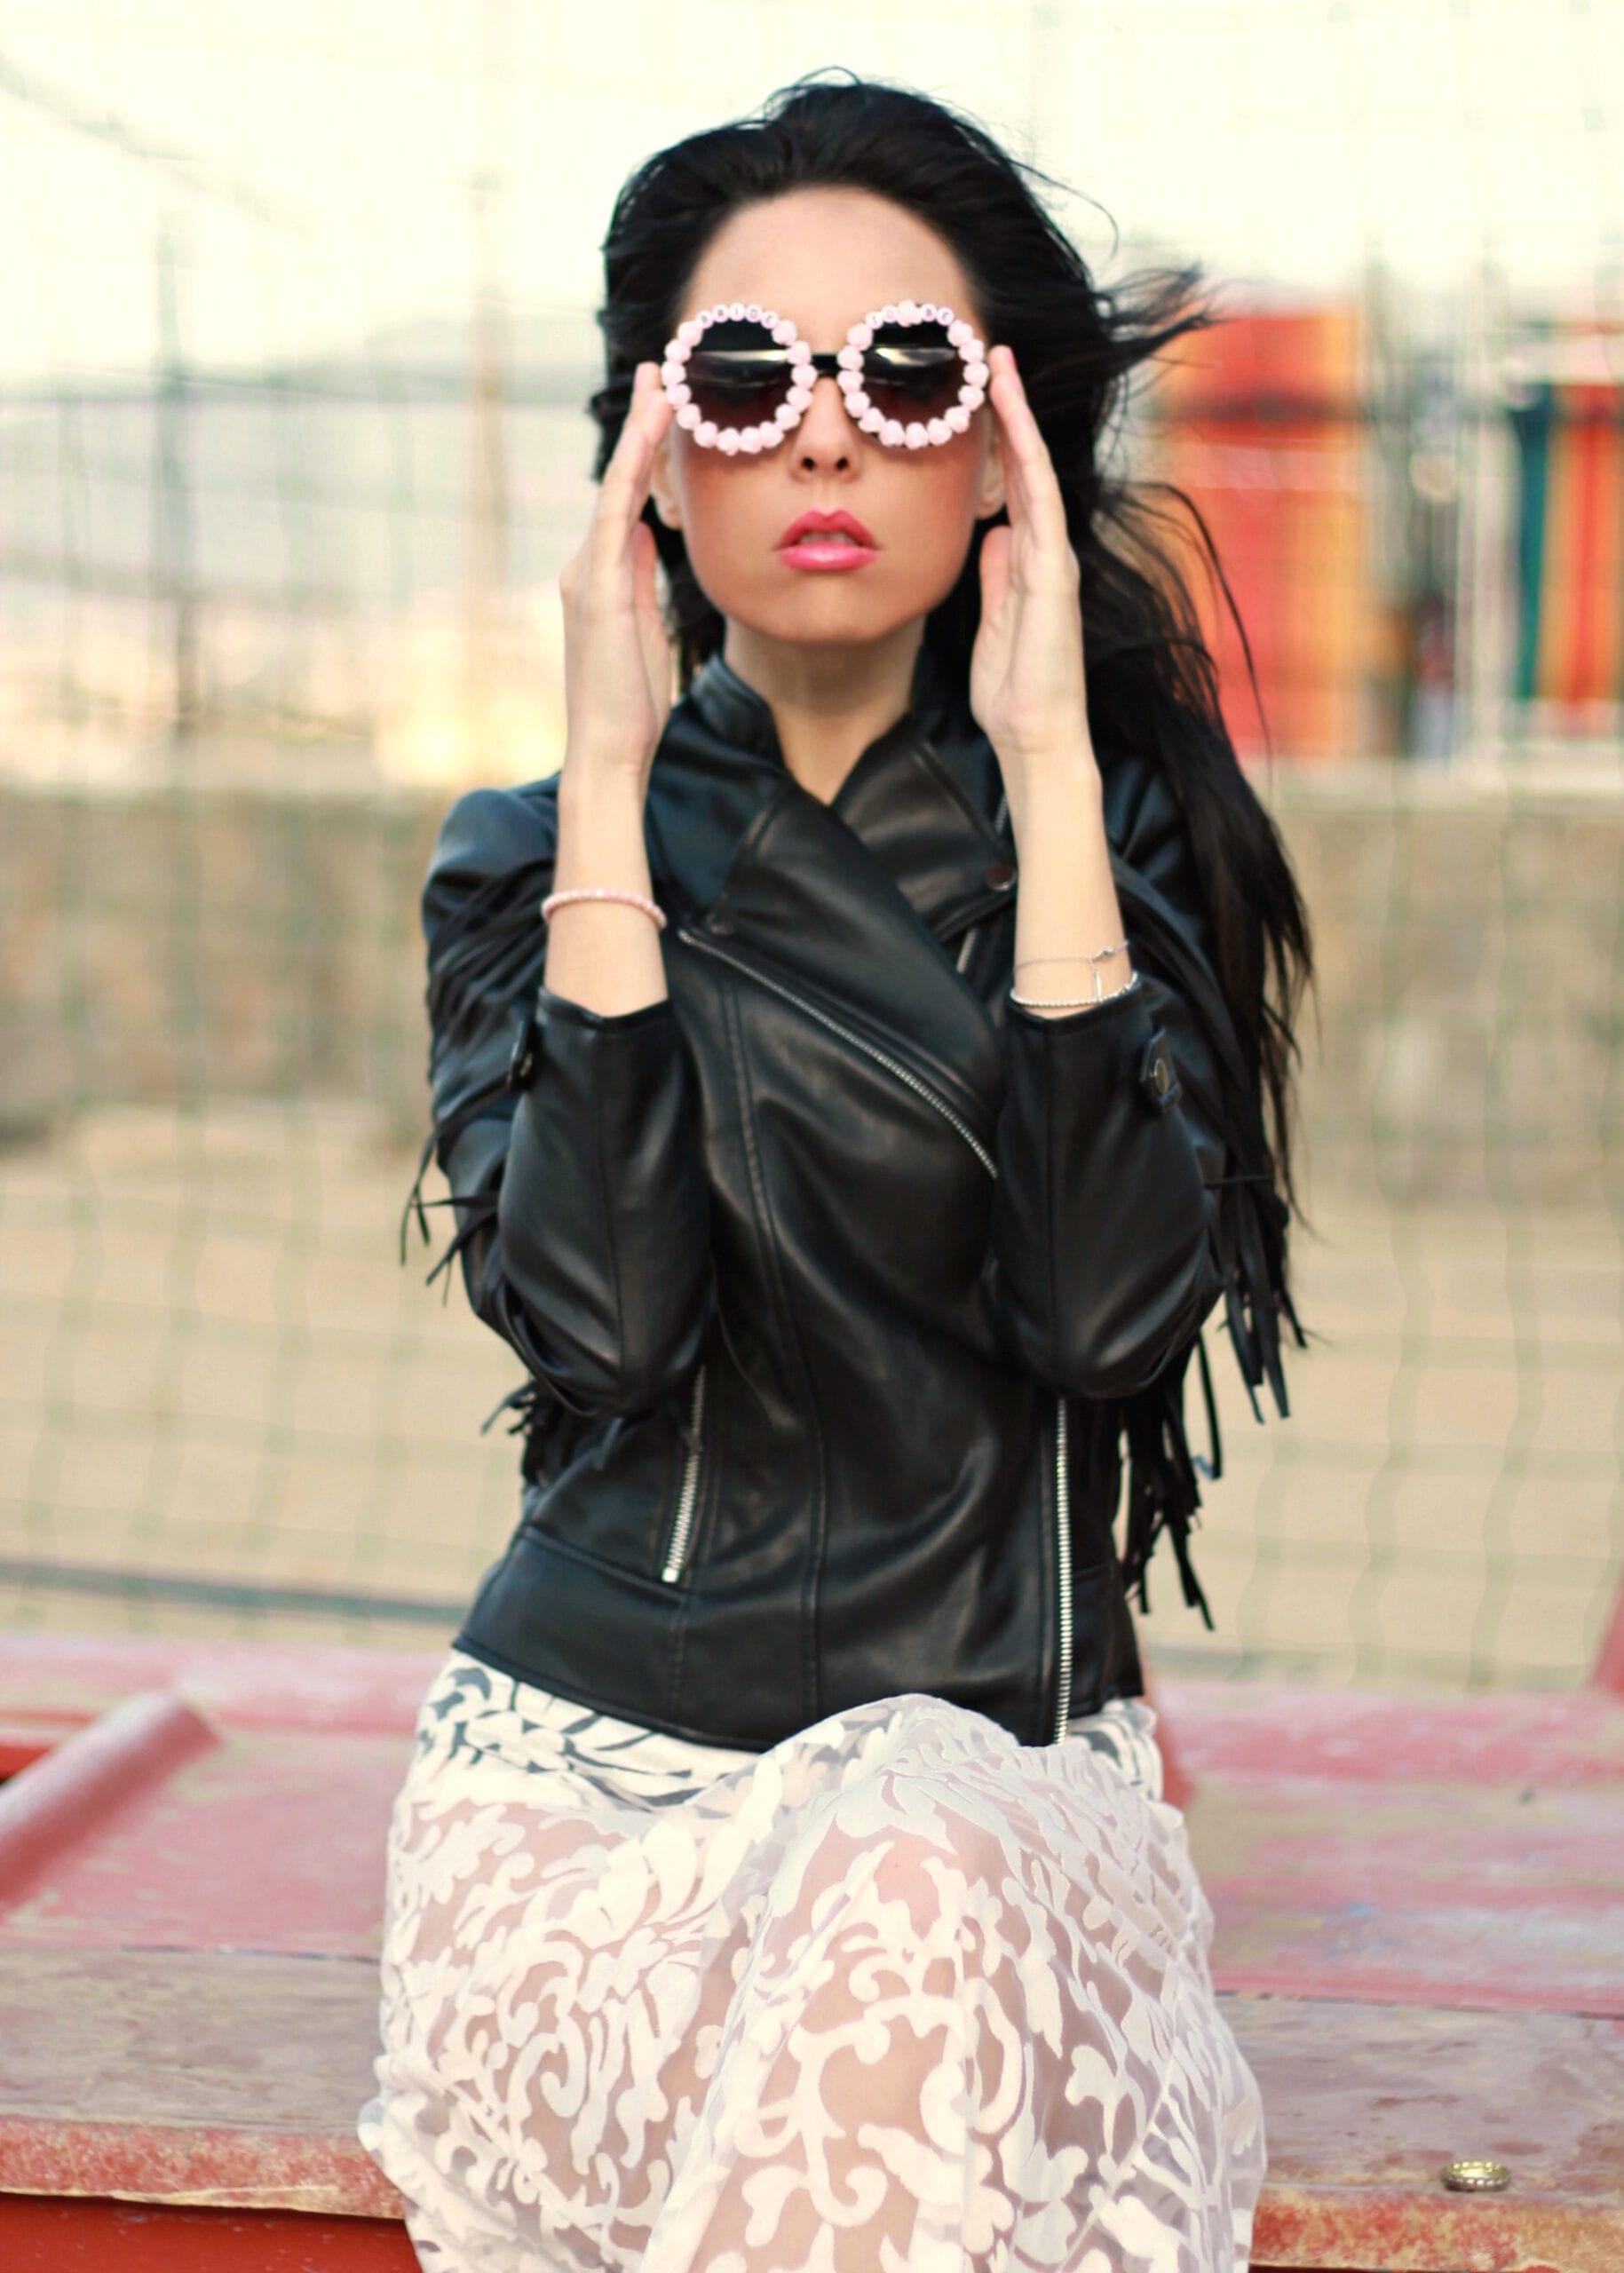 sindrome da eccezionalità, slimane lascia sain laurent motivo, theladycracy.it, elisa bellino, stress da prestazione creativa, stress da social network, dress see through summer 2016, outfit primavera estate 2016, tendenze moda estate 2016, abito asos trasparente 2016, fringes jacket 2016, biker fringes 2016, summer look 2016, fashion blog, fashion blogger famose, fashion bloggers, fashion blog italia, fashion blogger italiane, occhiali cool 2016,